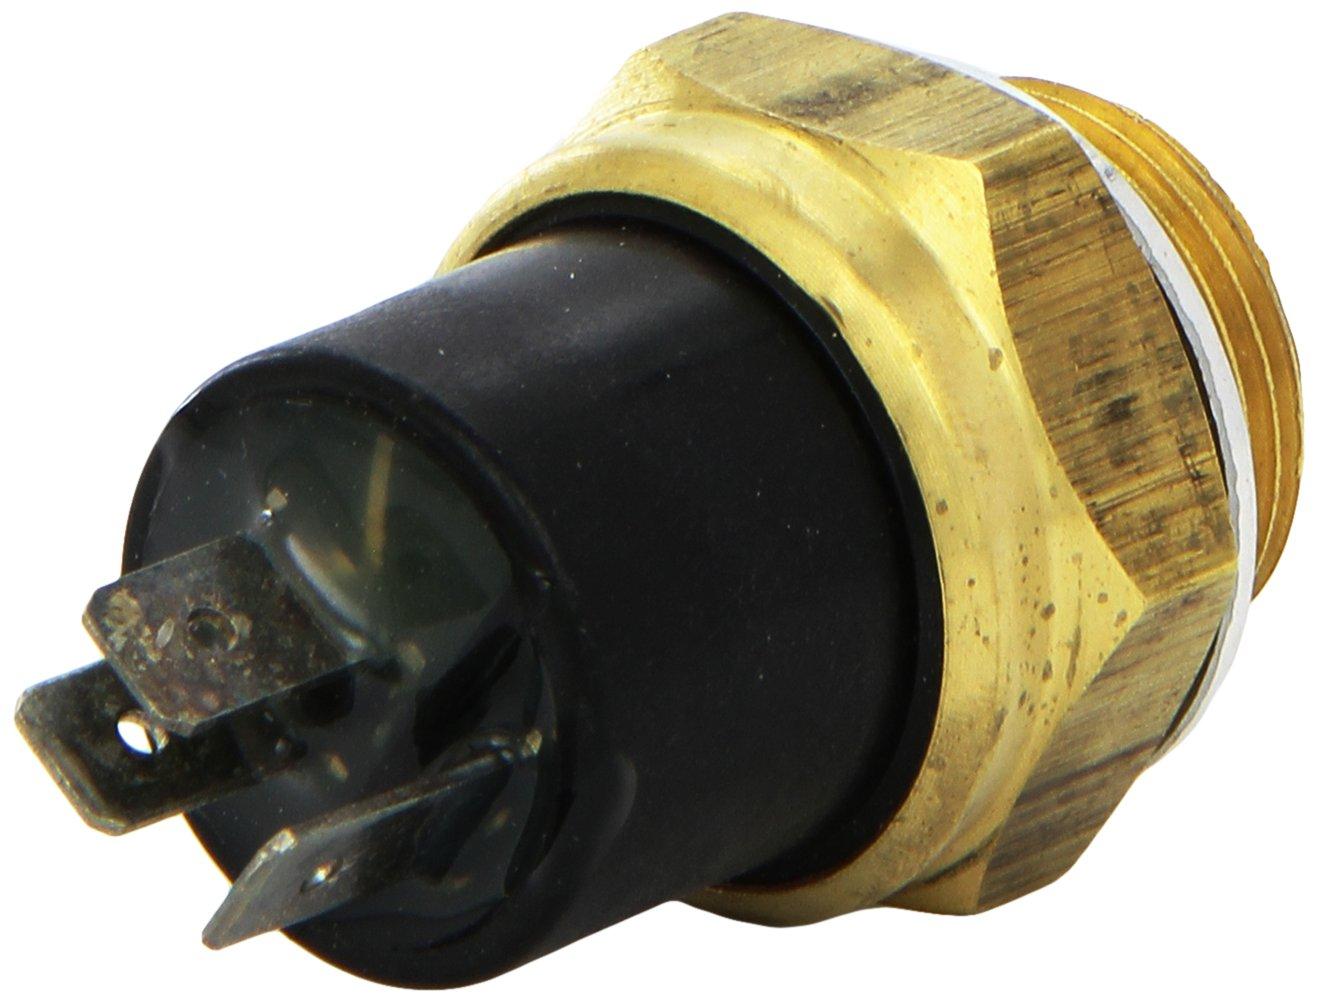 Valeo 819770 Interrupteur de tempé rature, ventilateur de radiateur